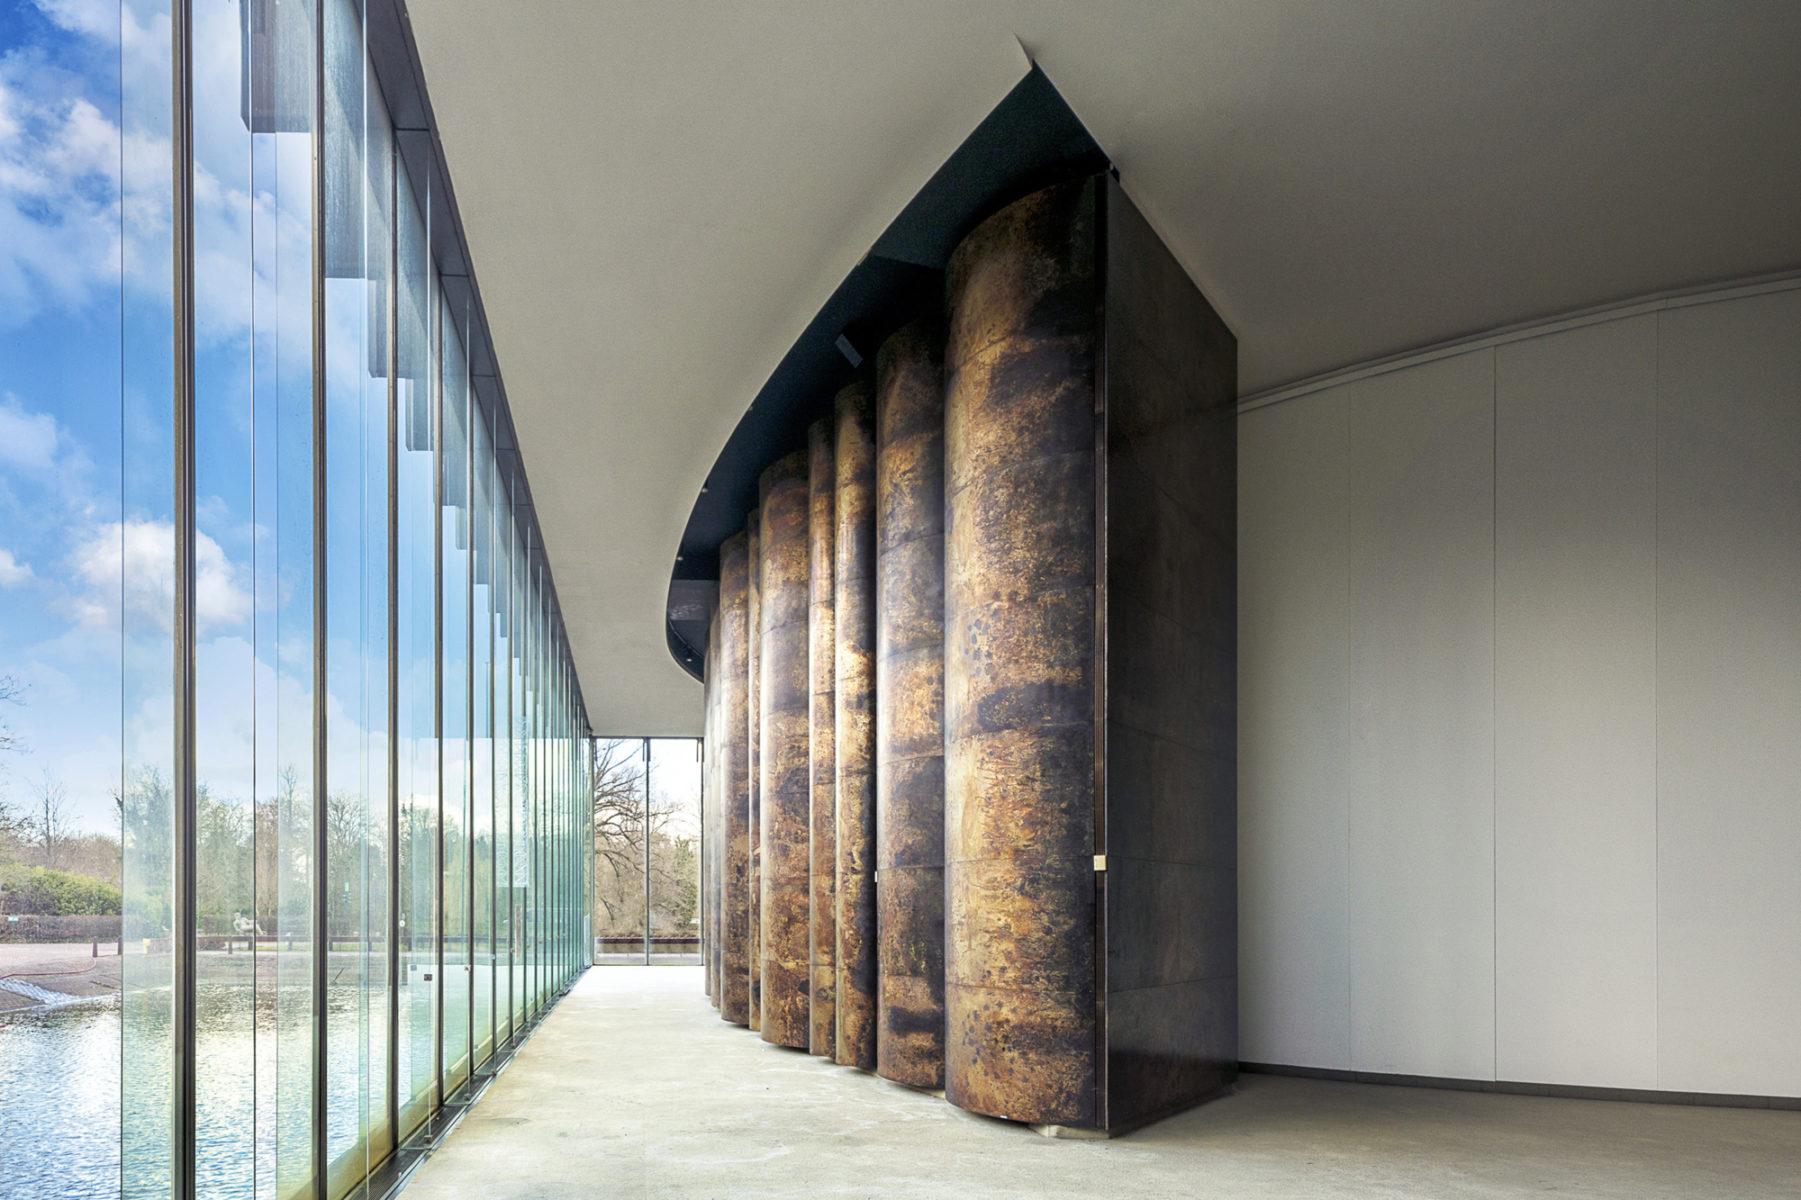 Existing building © Mireille Roobaert